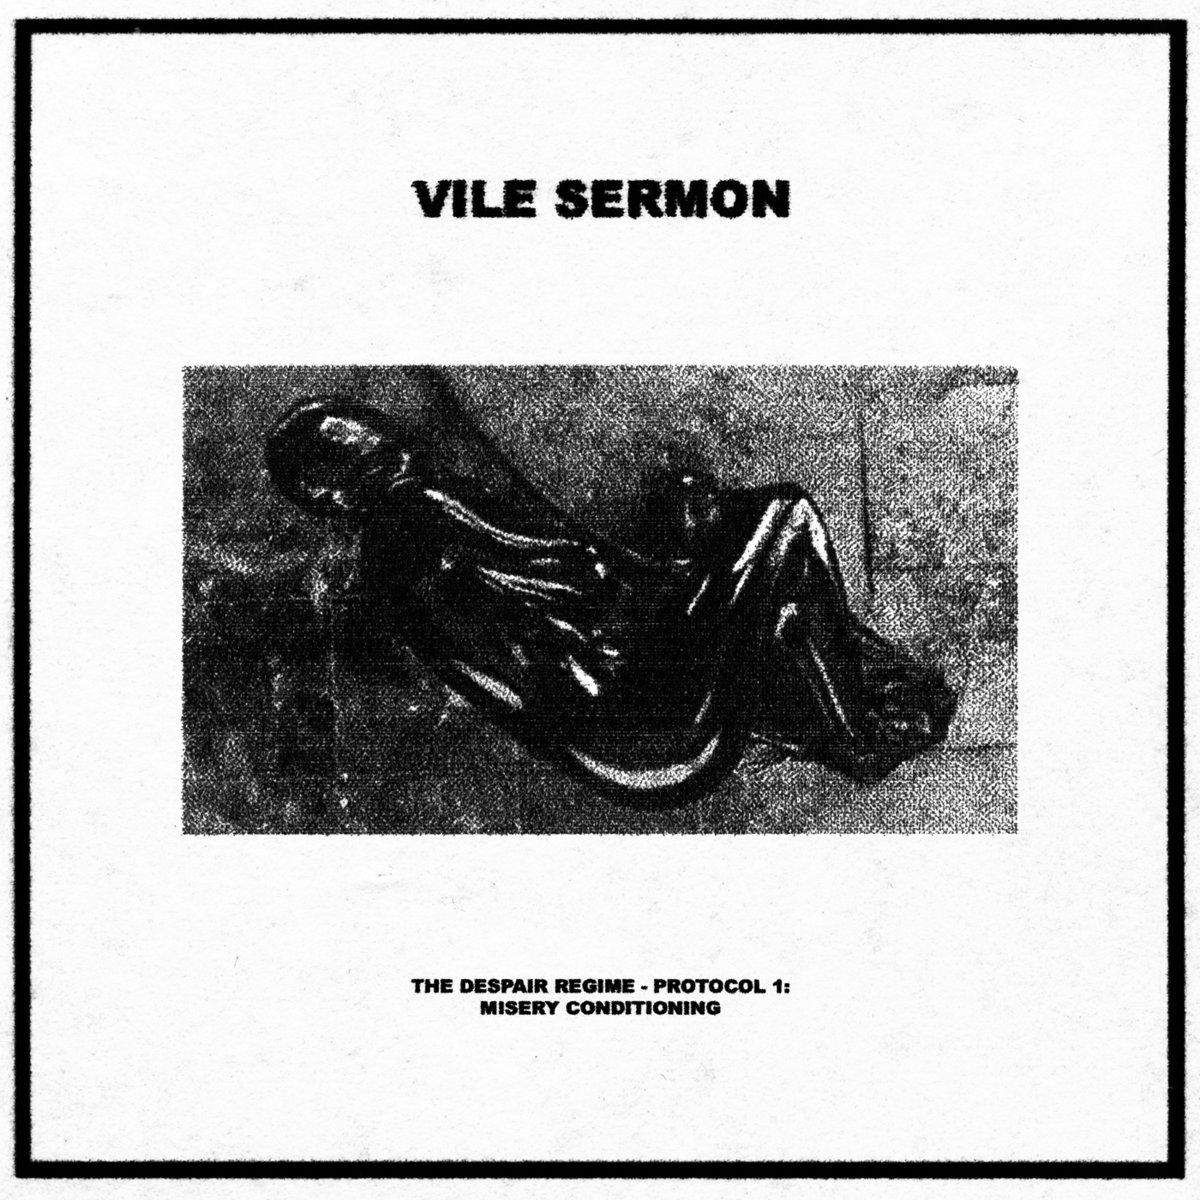 Programmed Cell Death | Vile Sermon